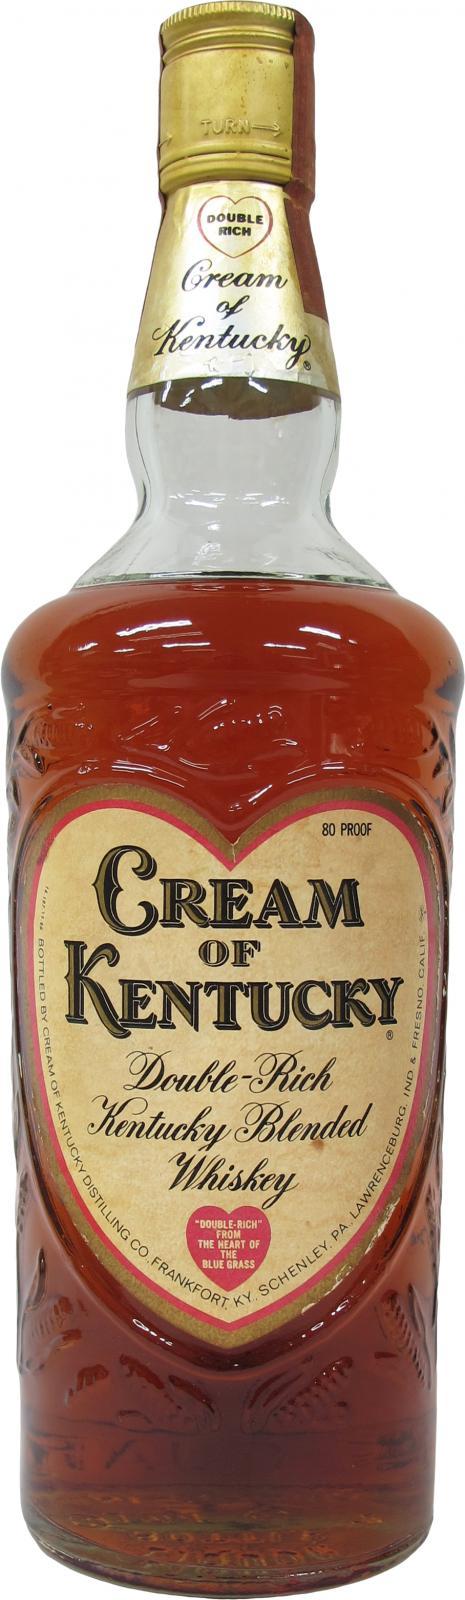 Cream of Kentucky Double-Rich Kentucky Blended Whiskey